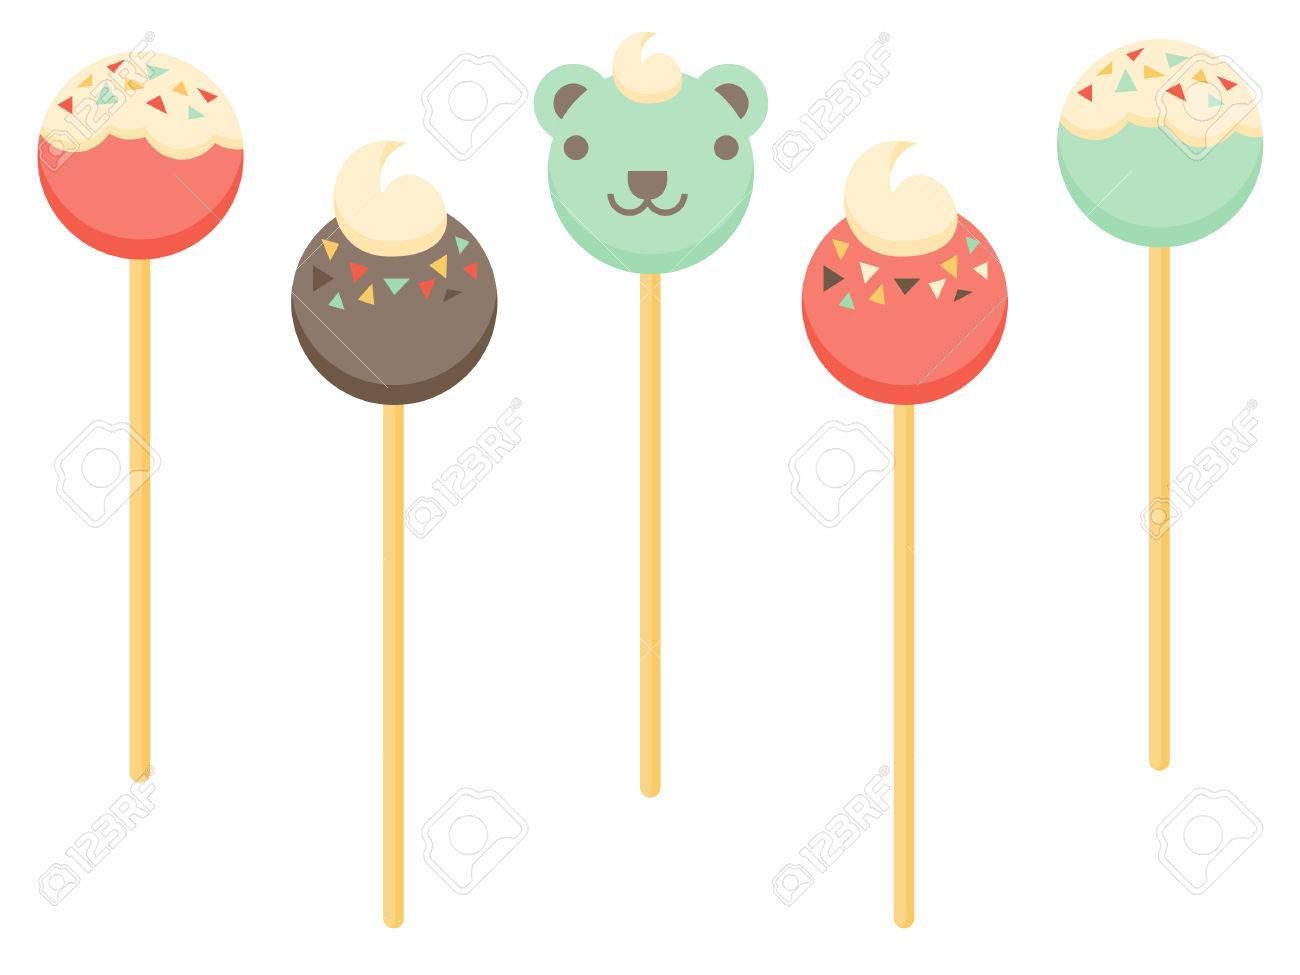 Various Cake Pop Designs Including A Teddy Bear Cake Pop Royalty ...